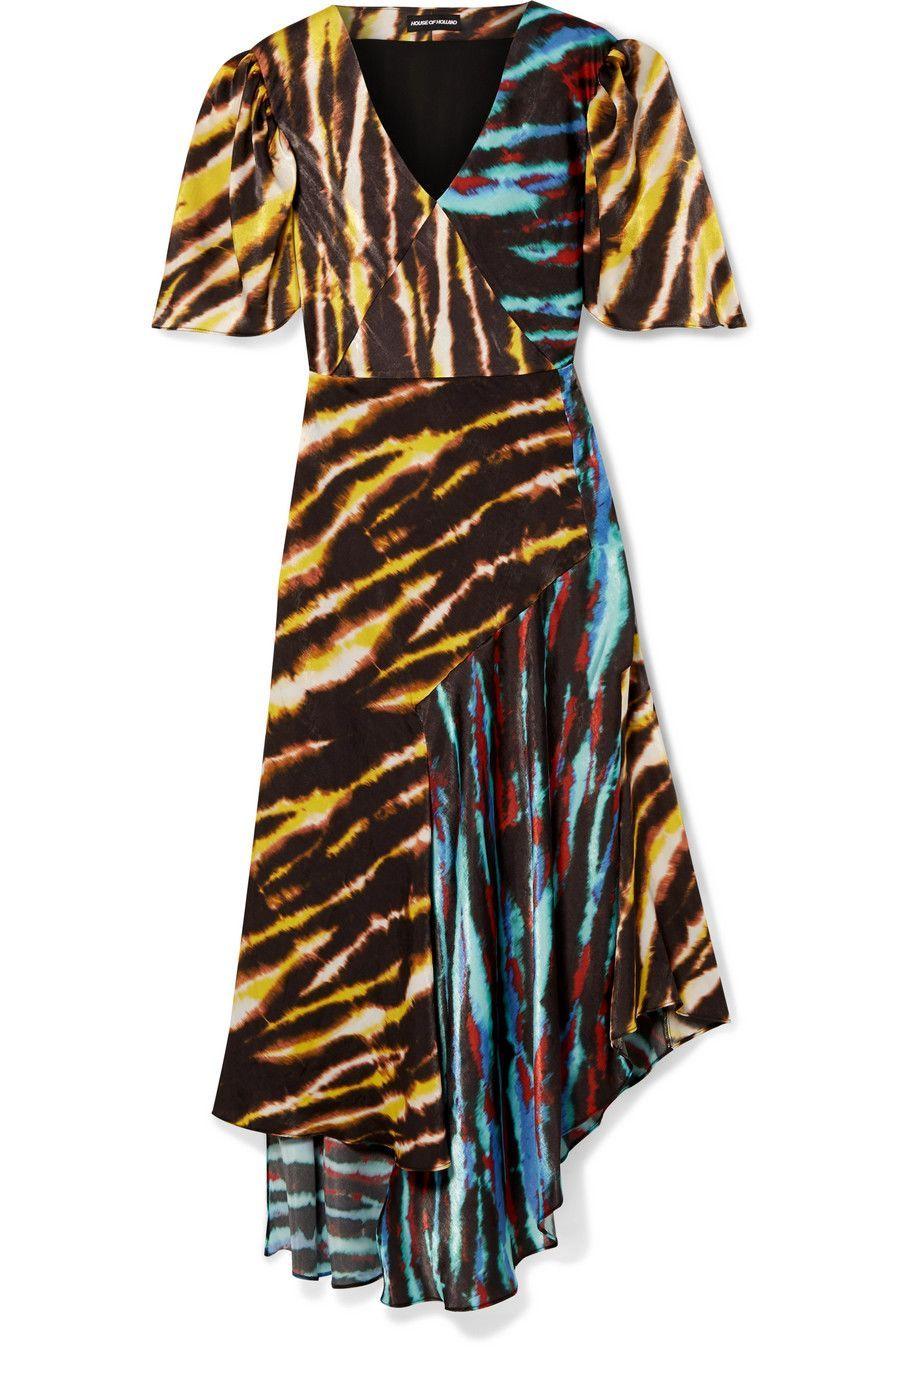 #PopbelaOOTD: Statement dengan Dress Bermotif